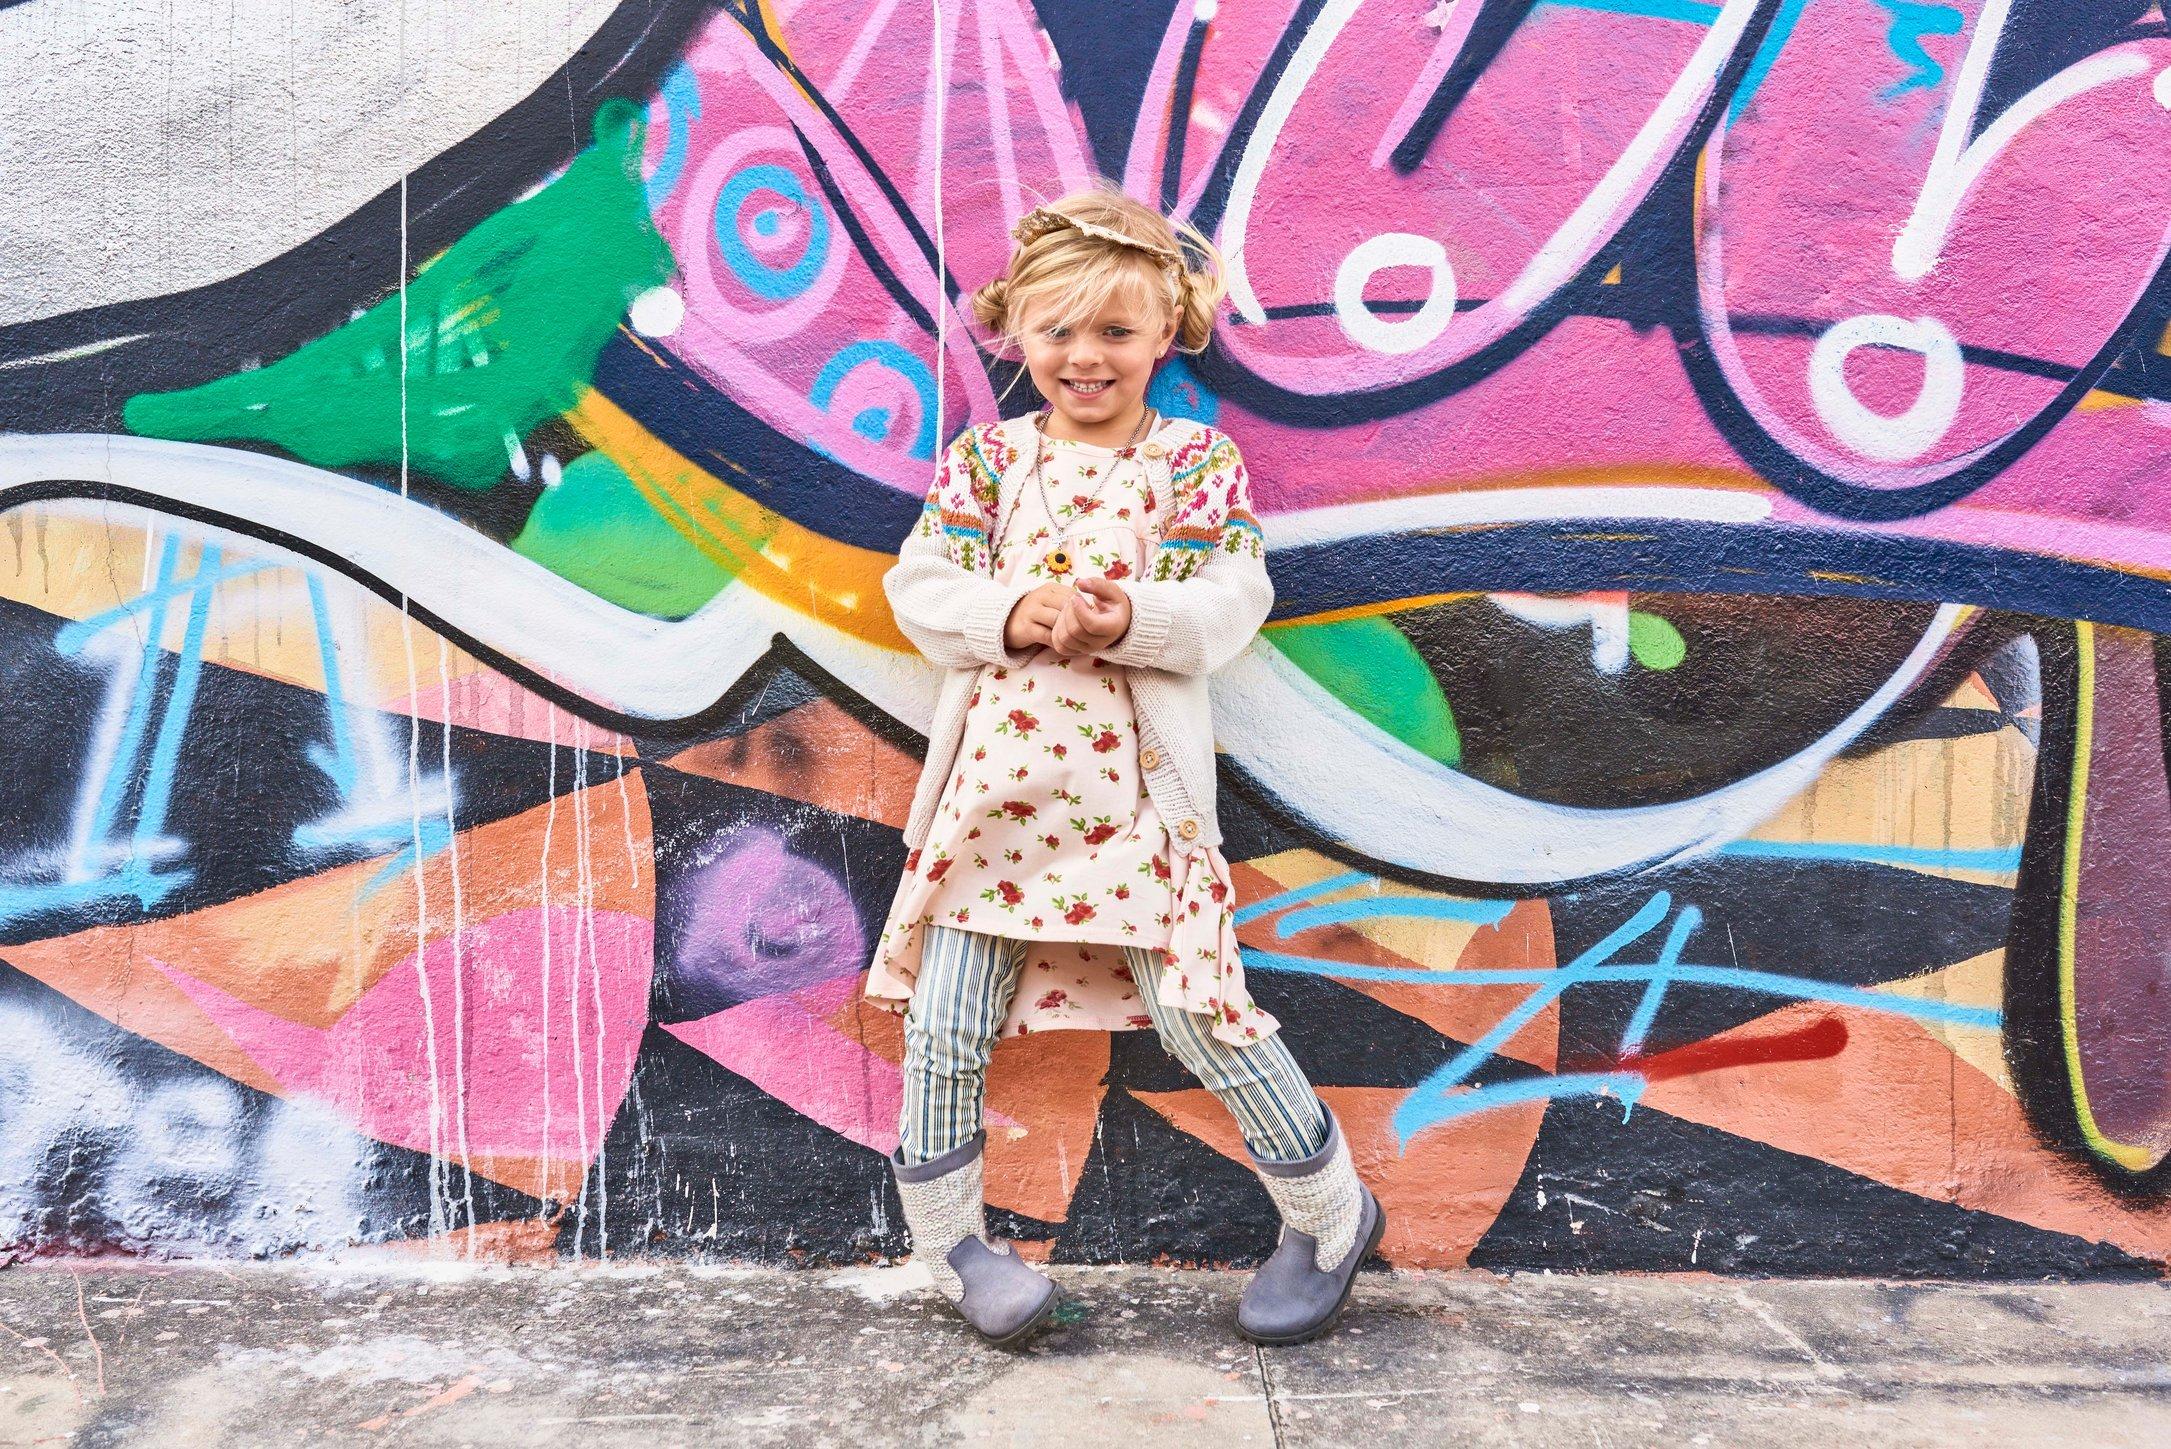 Sandnes_Kids_Miami_7258BWBW.jpg